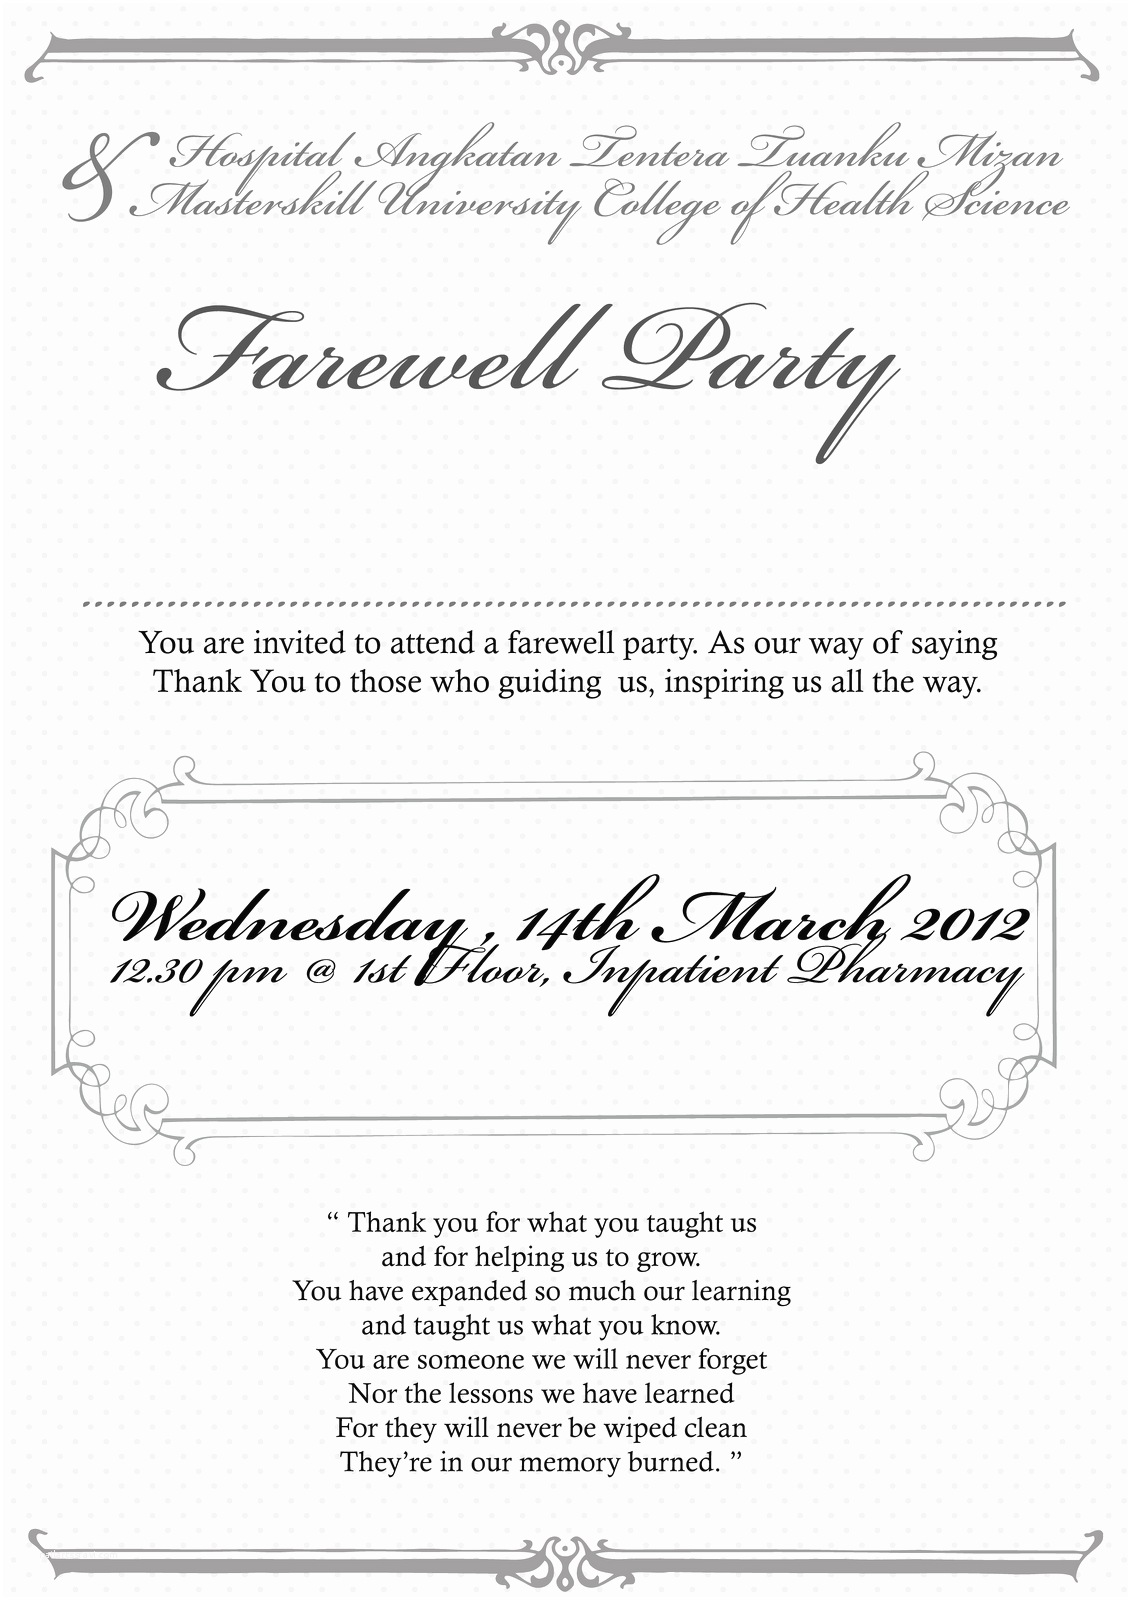 Goodbye Party Invitation Farewell Party Invitation Wording